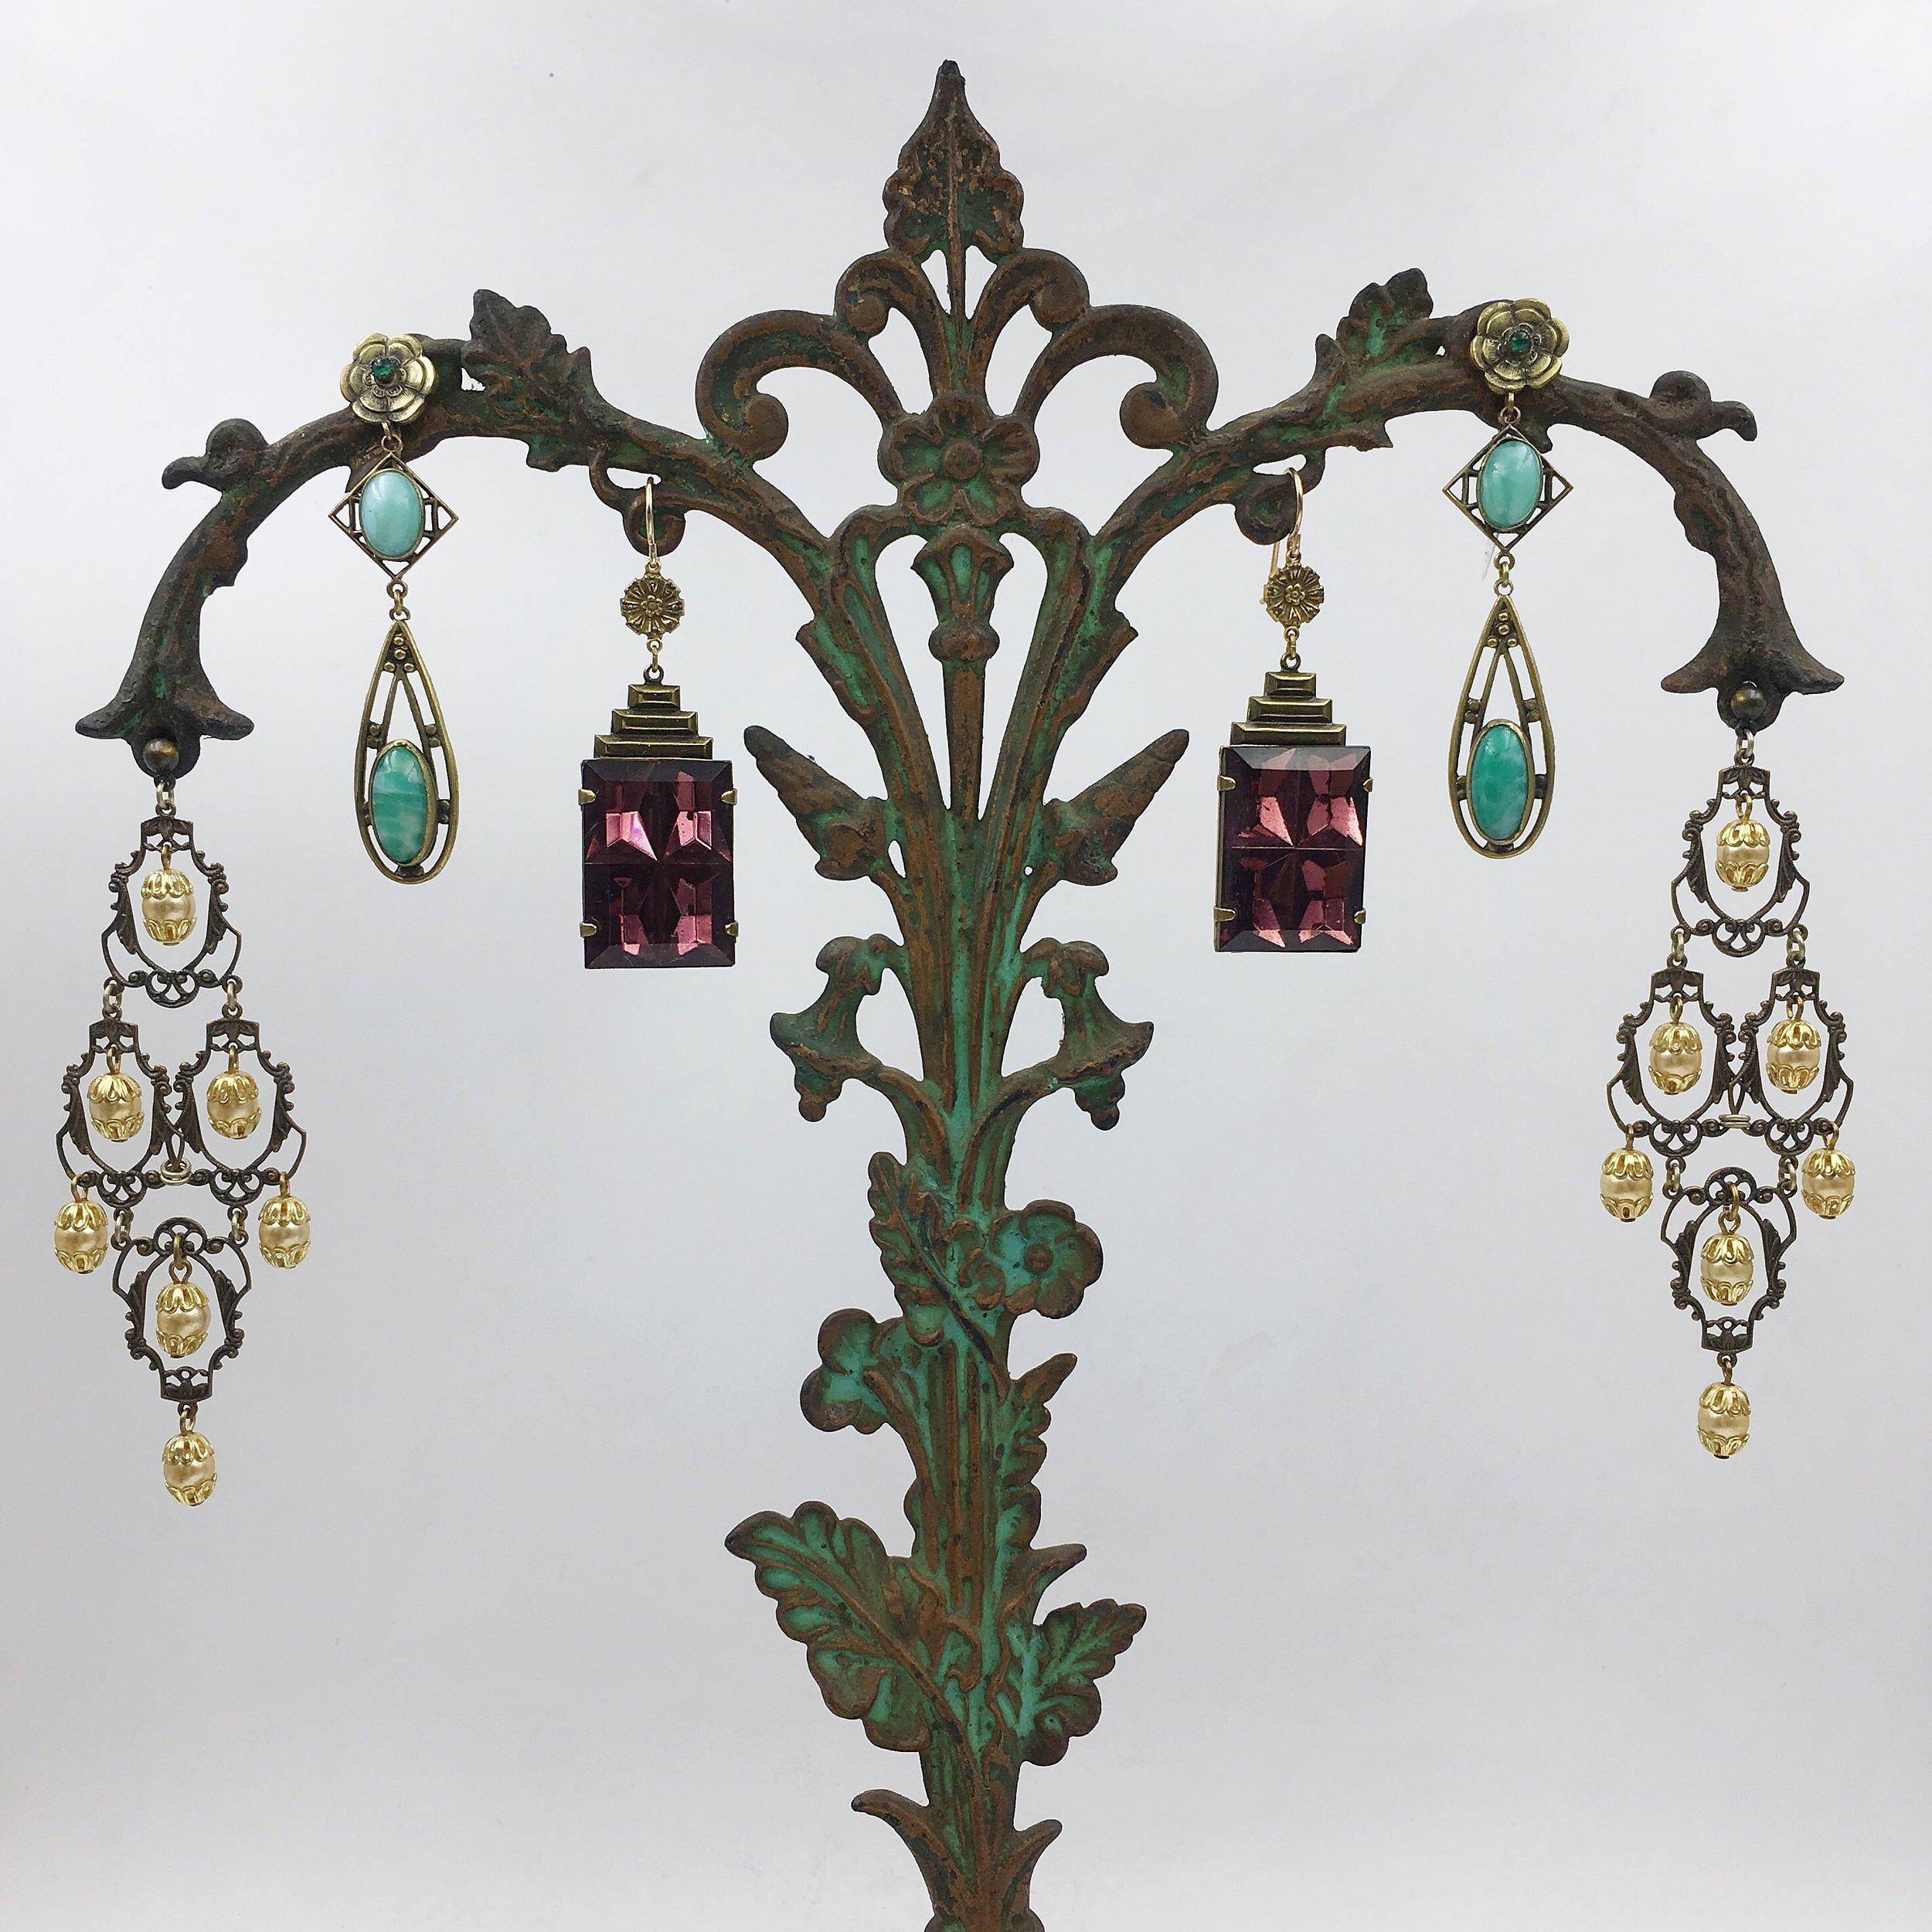 Vintage statement earrings Reverie vintage jewelry NYC